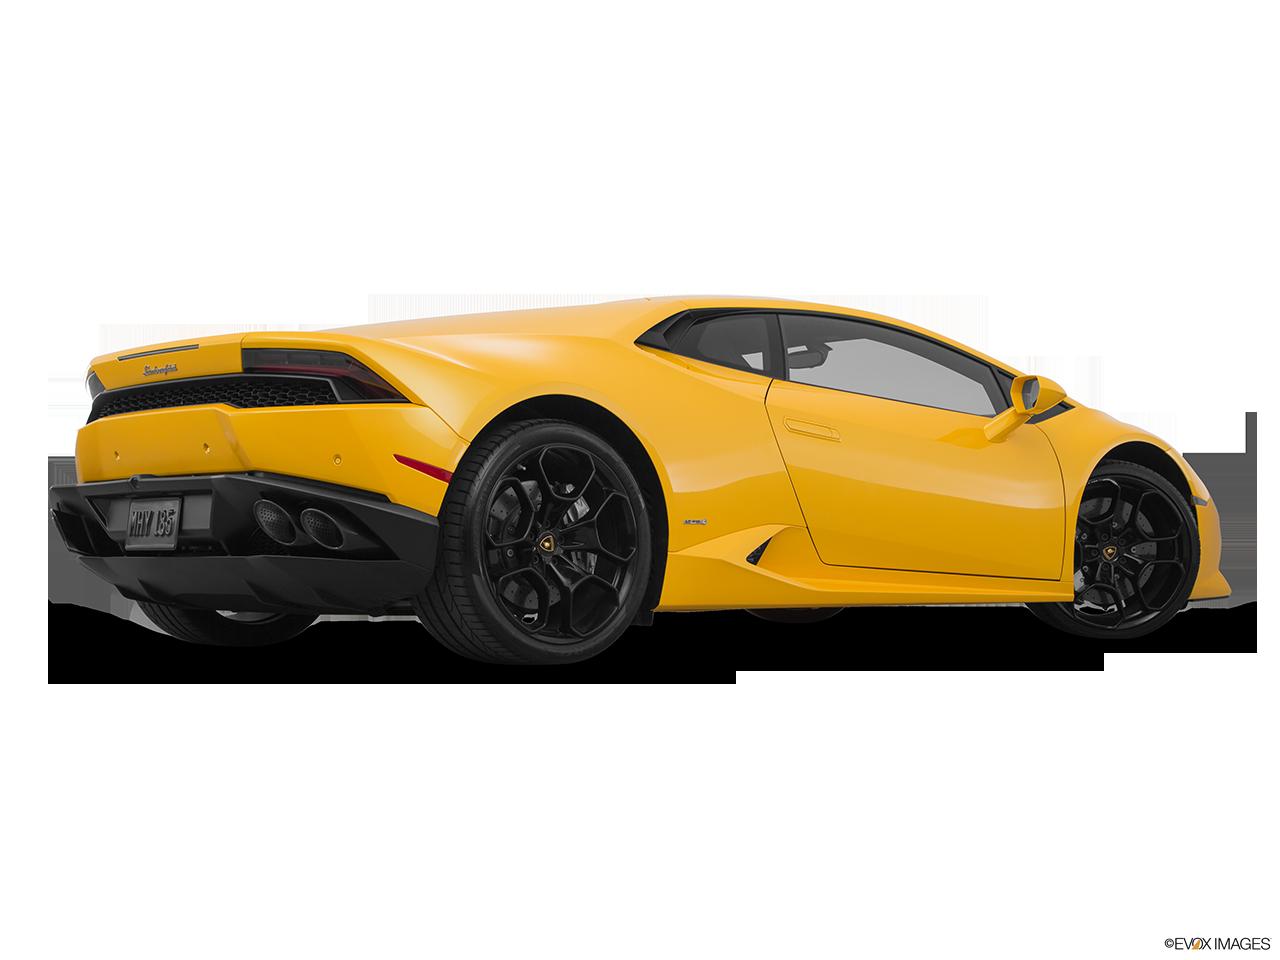 2019 Lamborghini Huracan photo